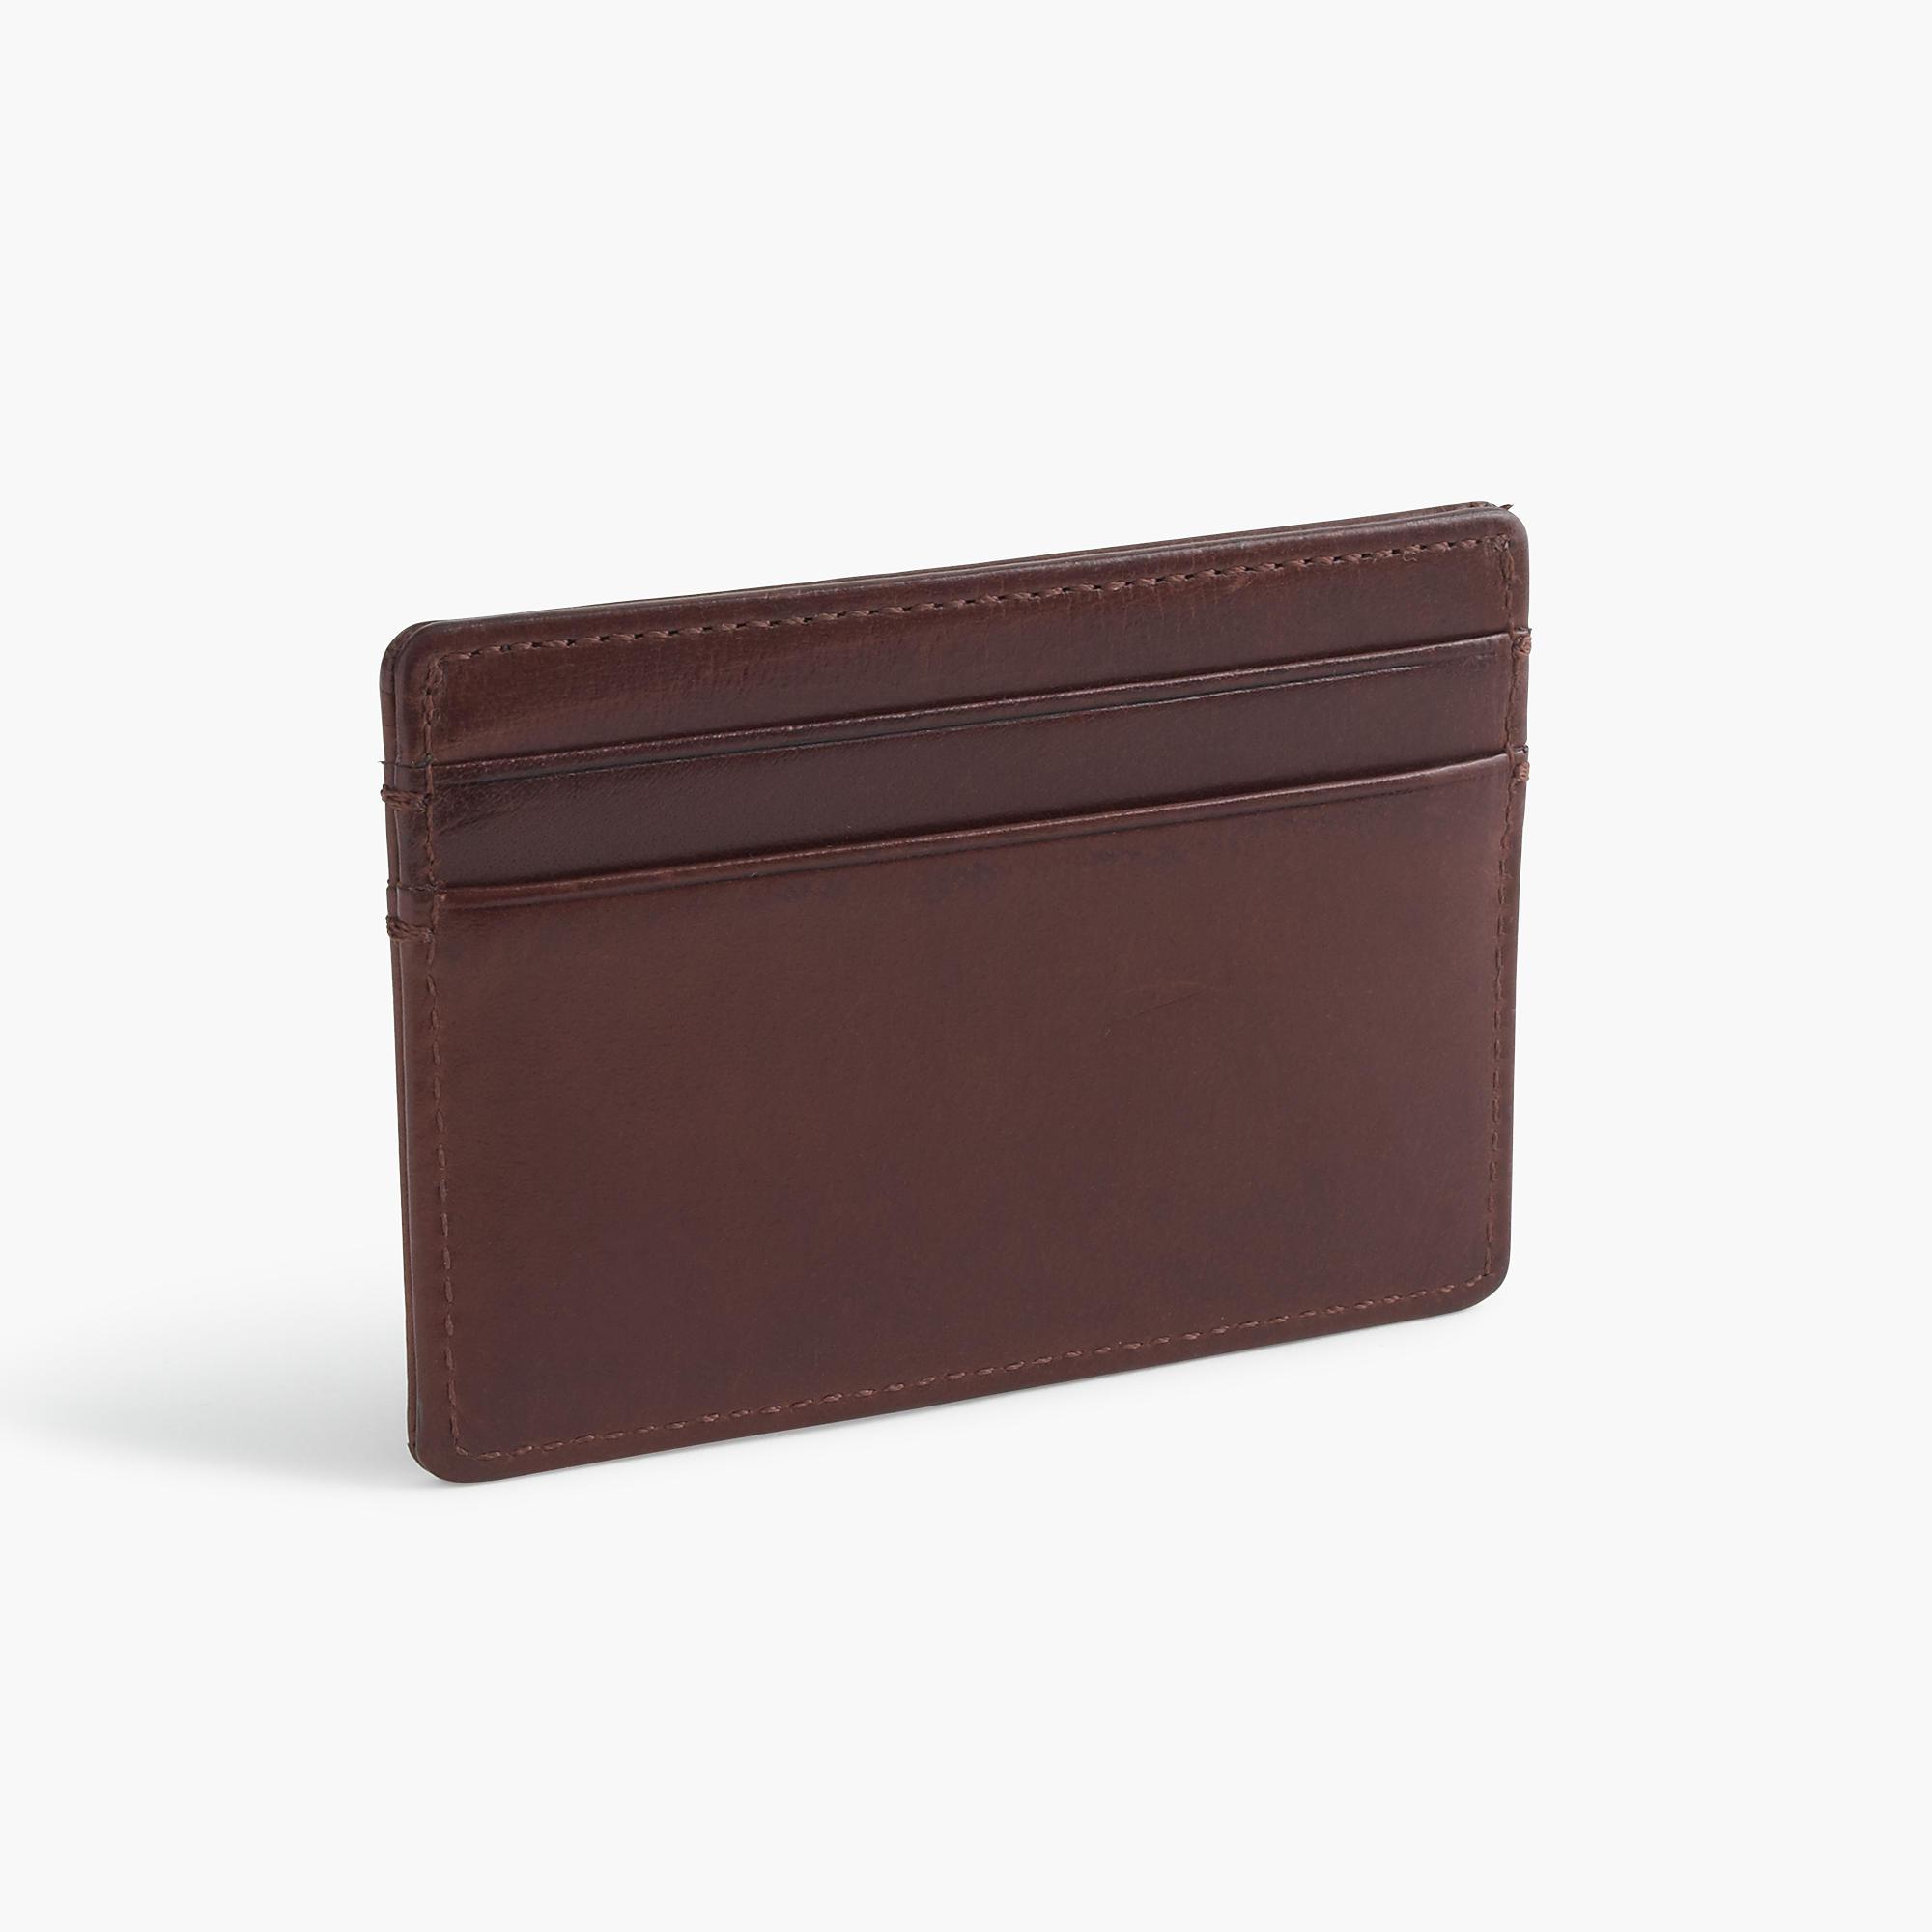 slim leather card case   men u0026 39 s wallets